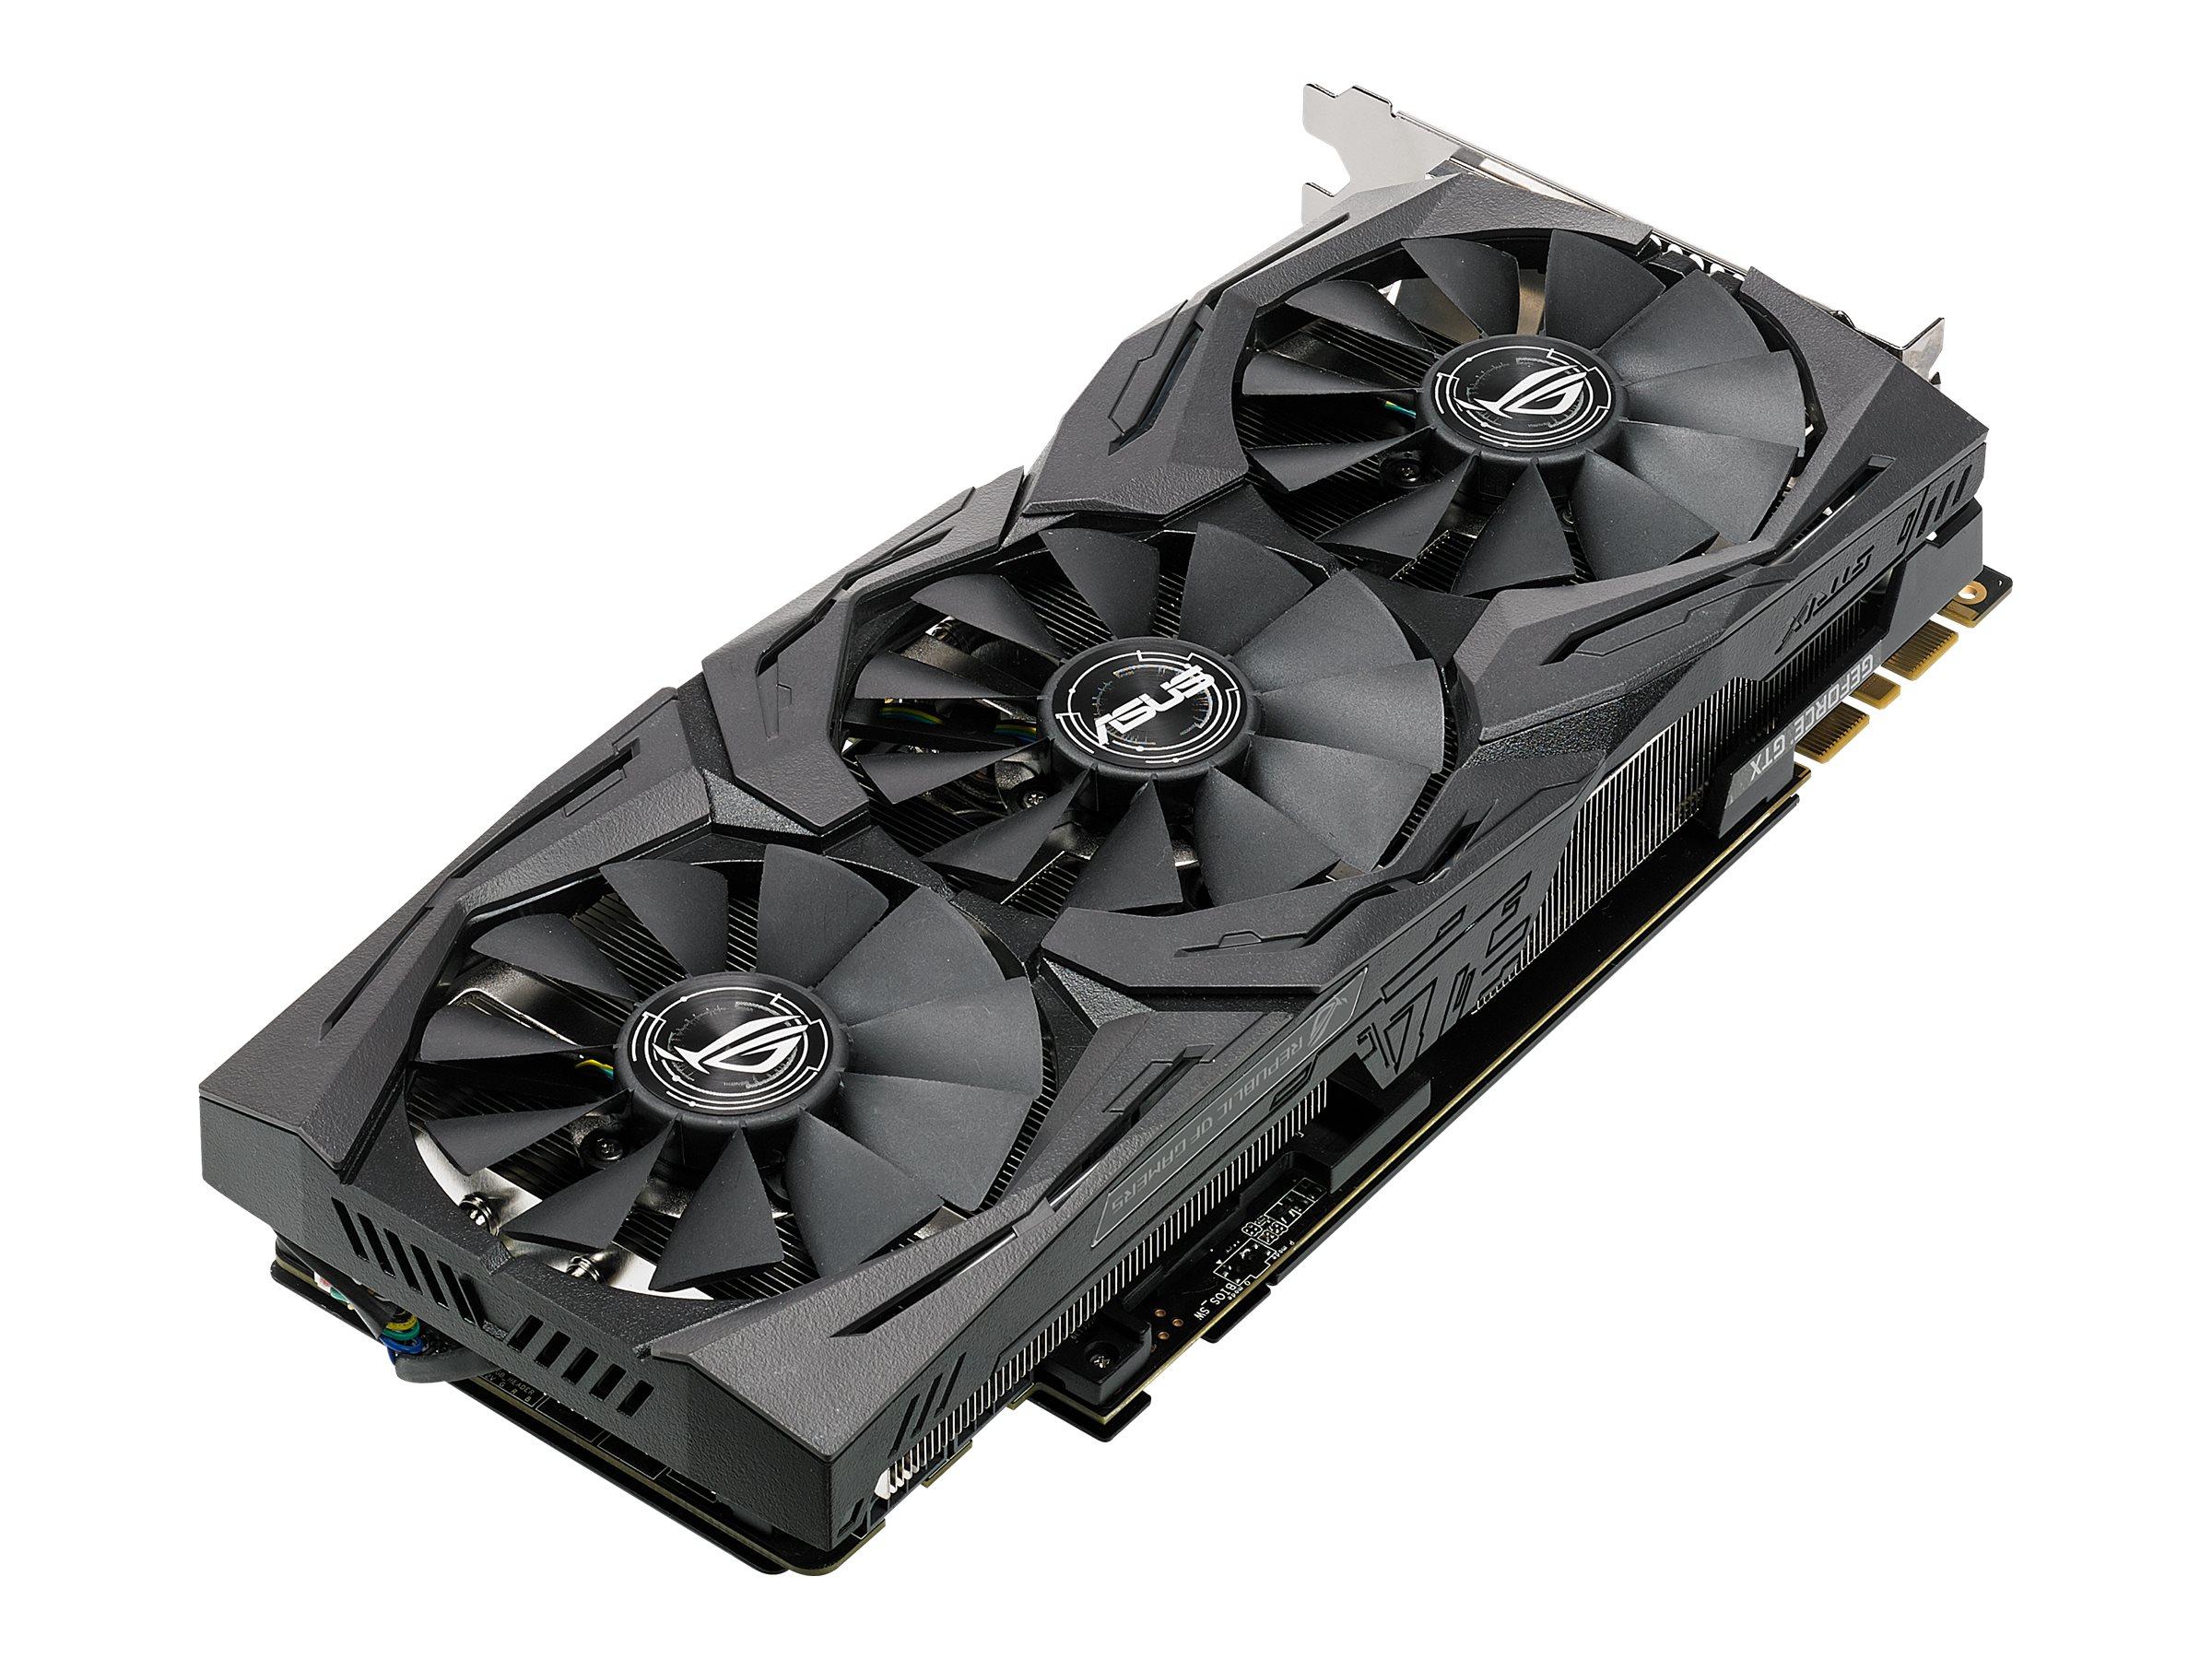 ASUS ROG STRIX-GTX1080-O8G-11GBPS